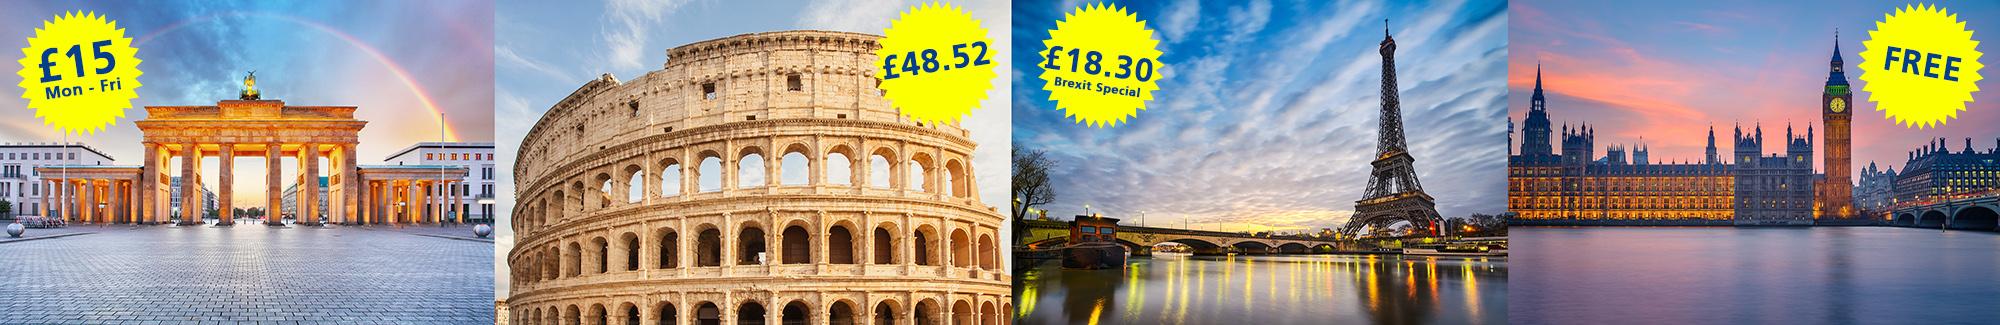 Brexit Photography european landmarks brandenburg gate eiffel tower big ben colosseum rome